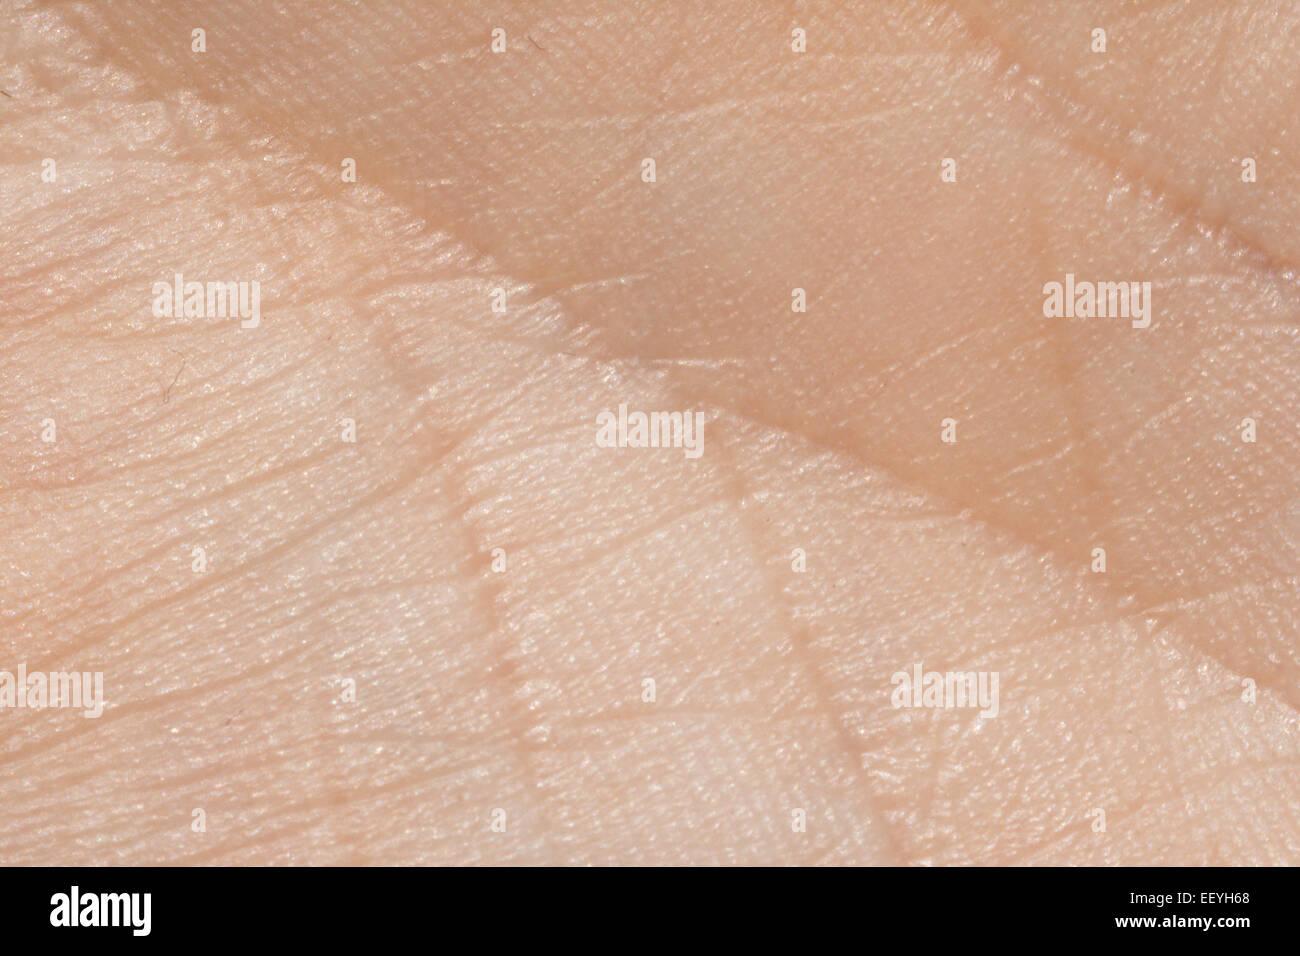 La pelle umana texture closeup dettaglio Immagini Stock